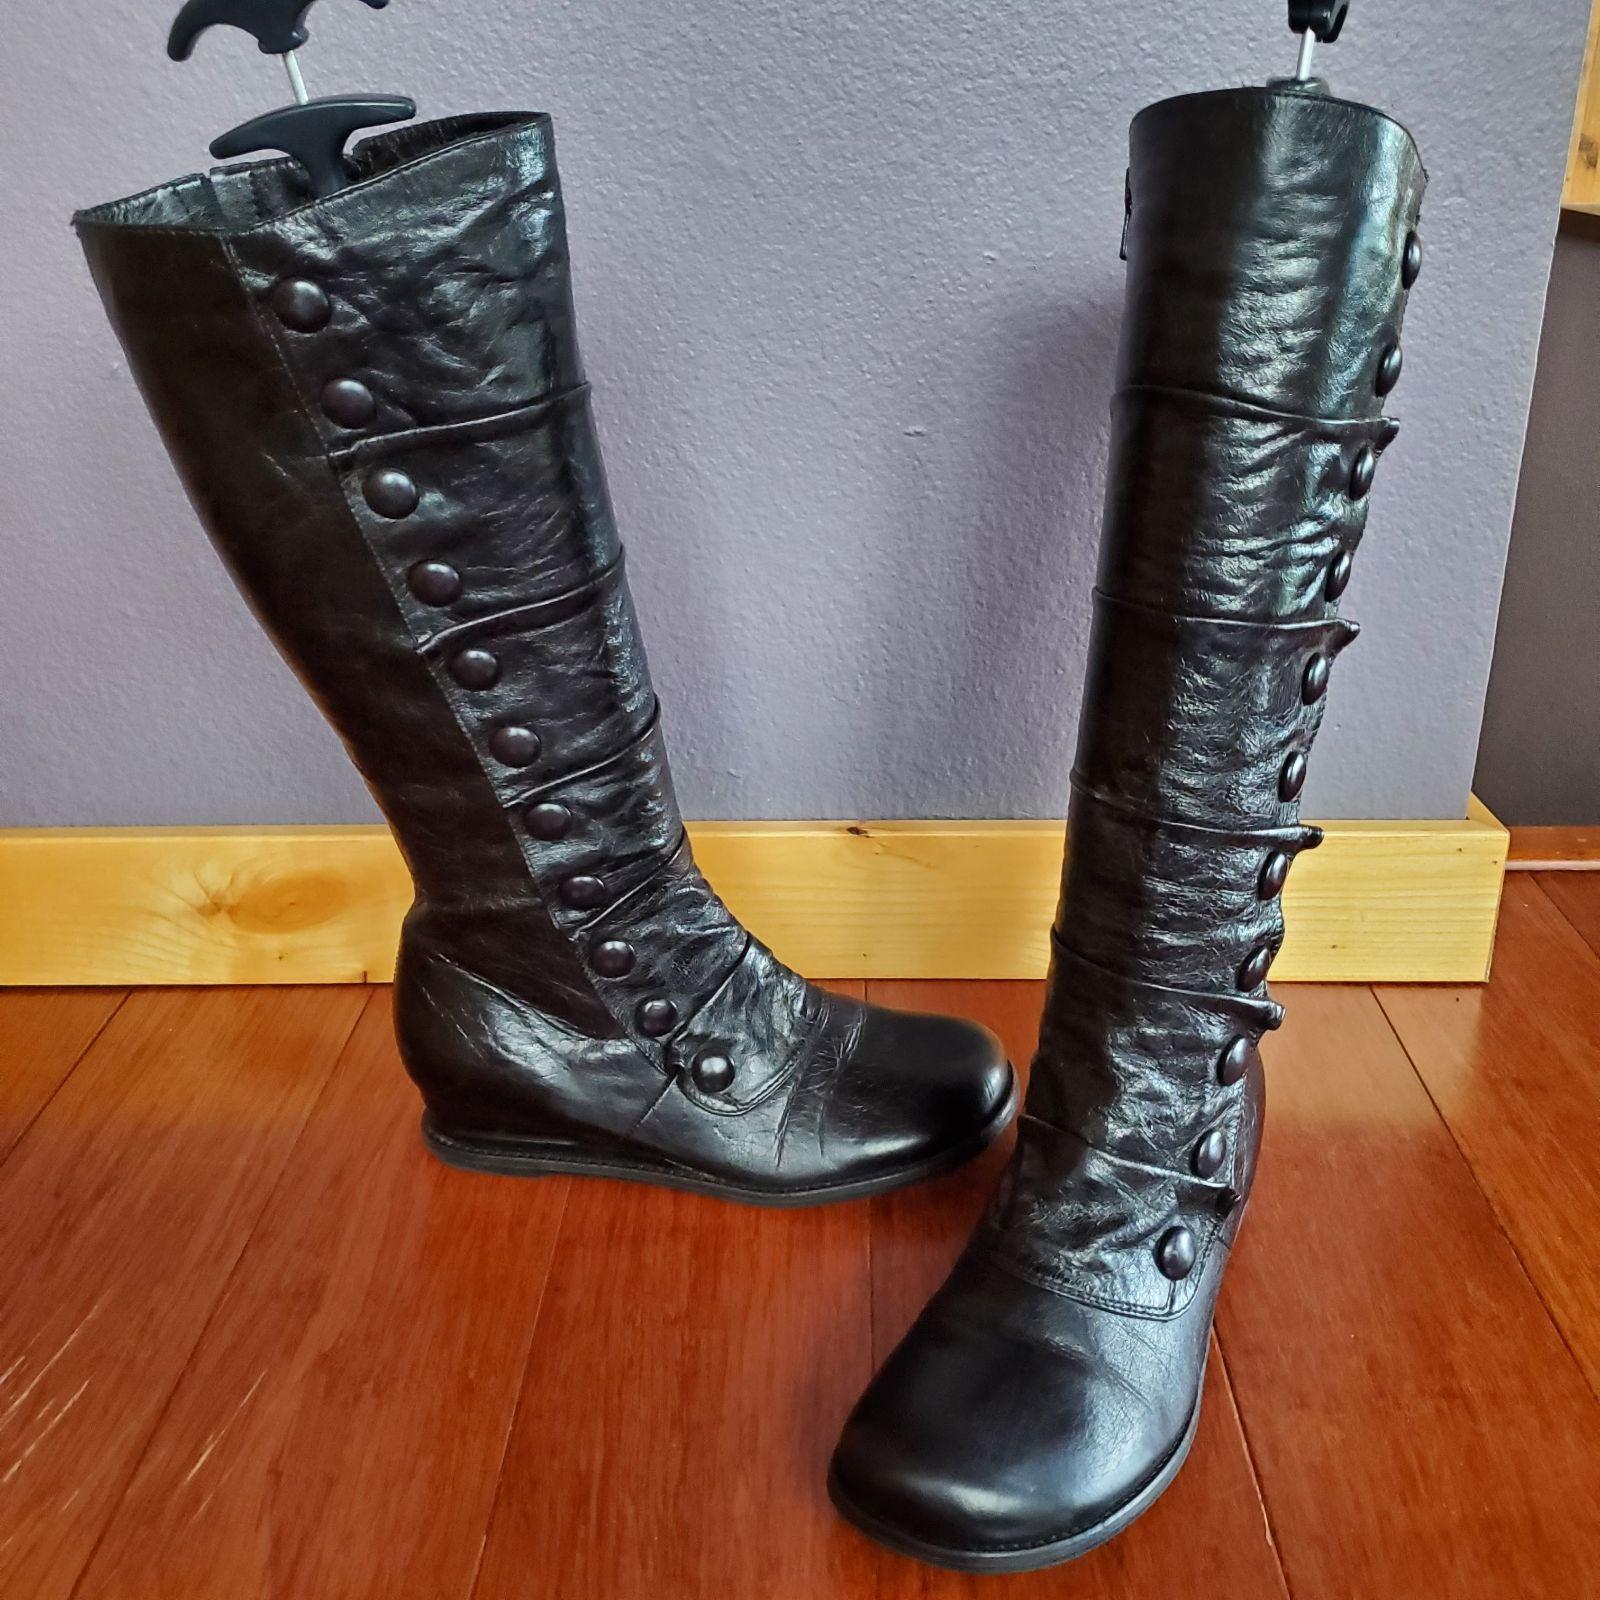 Miz Mooz Bloom Black Knee High Boots